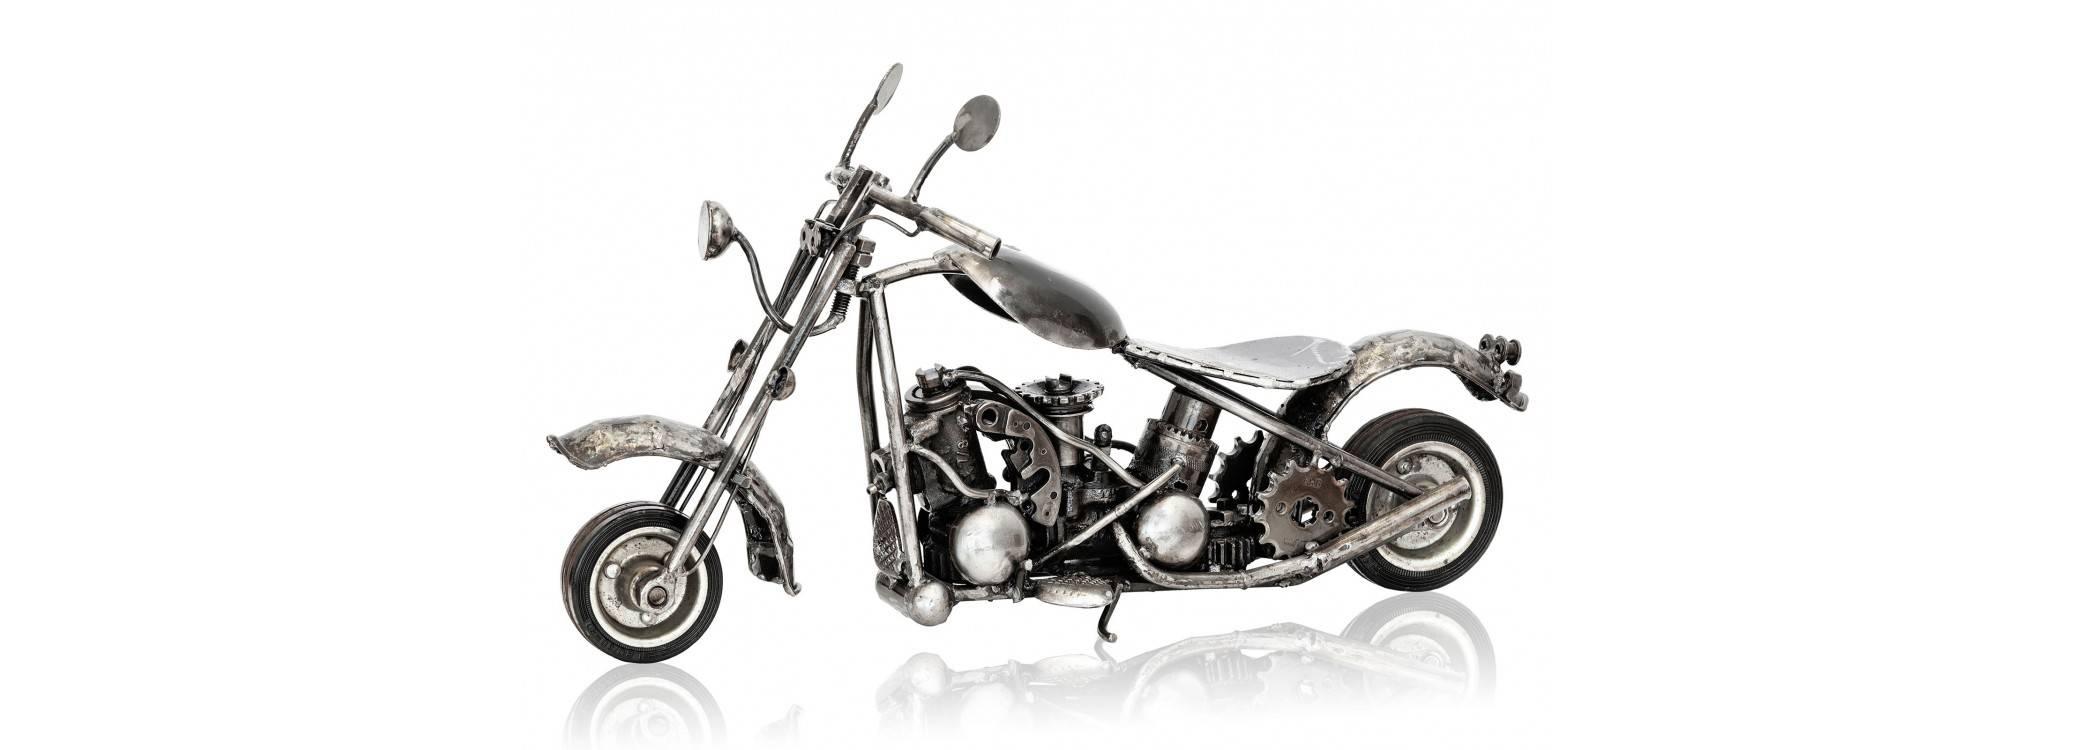 Sculpture de chopper en pièces de motos